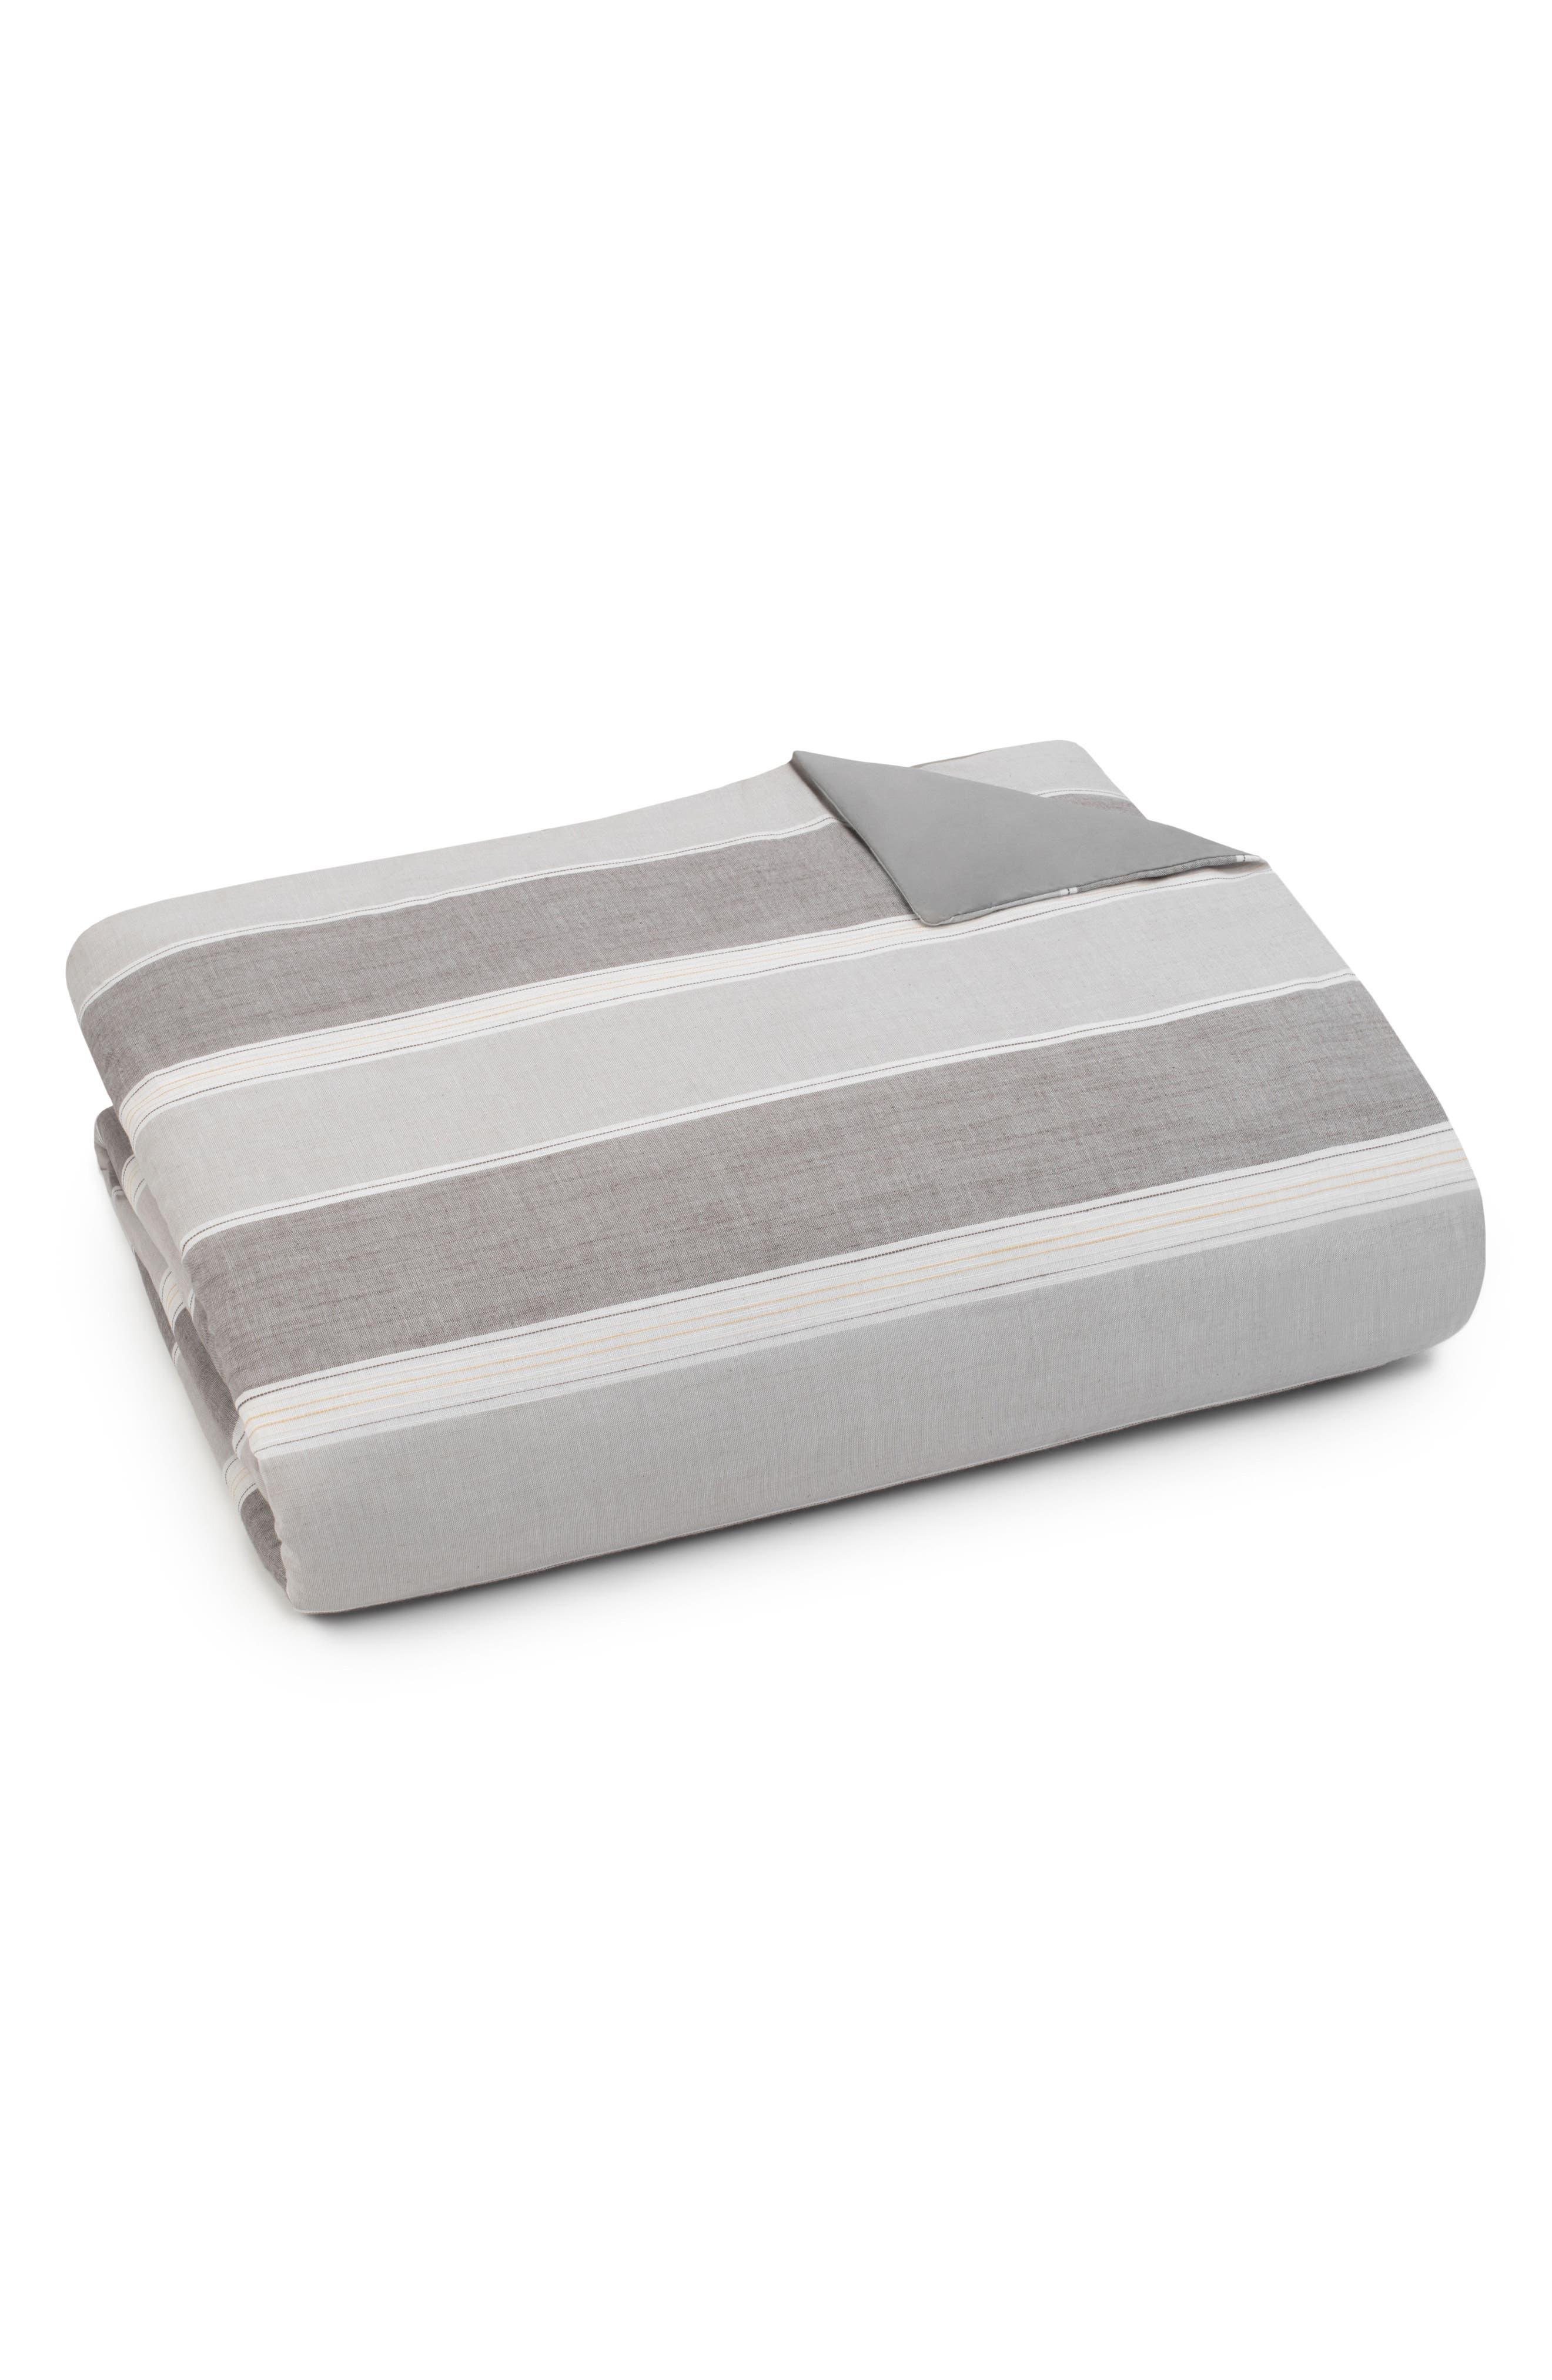 Oxford Stripe Duvet Cover,                         Main,                         color, GREY MULTI